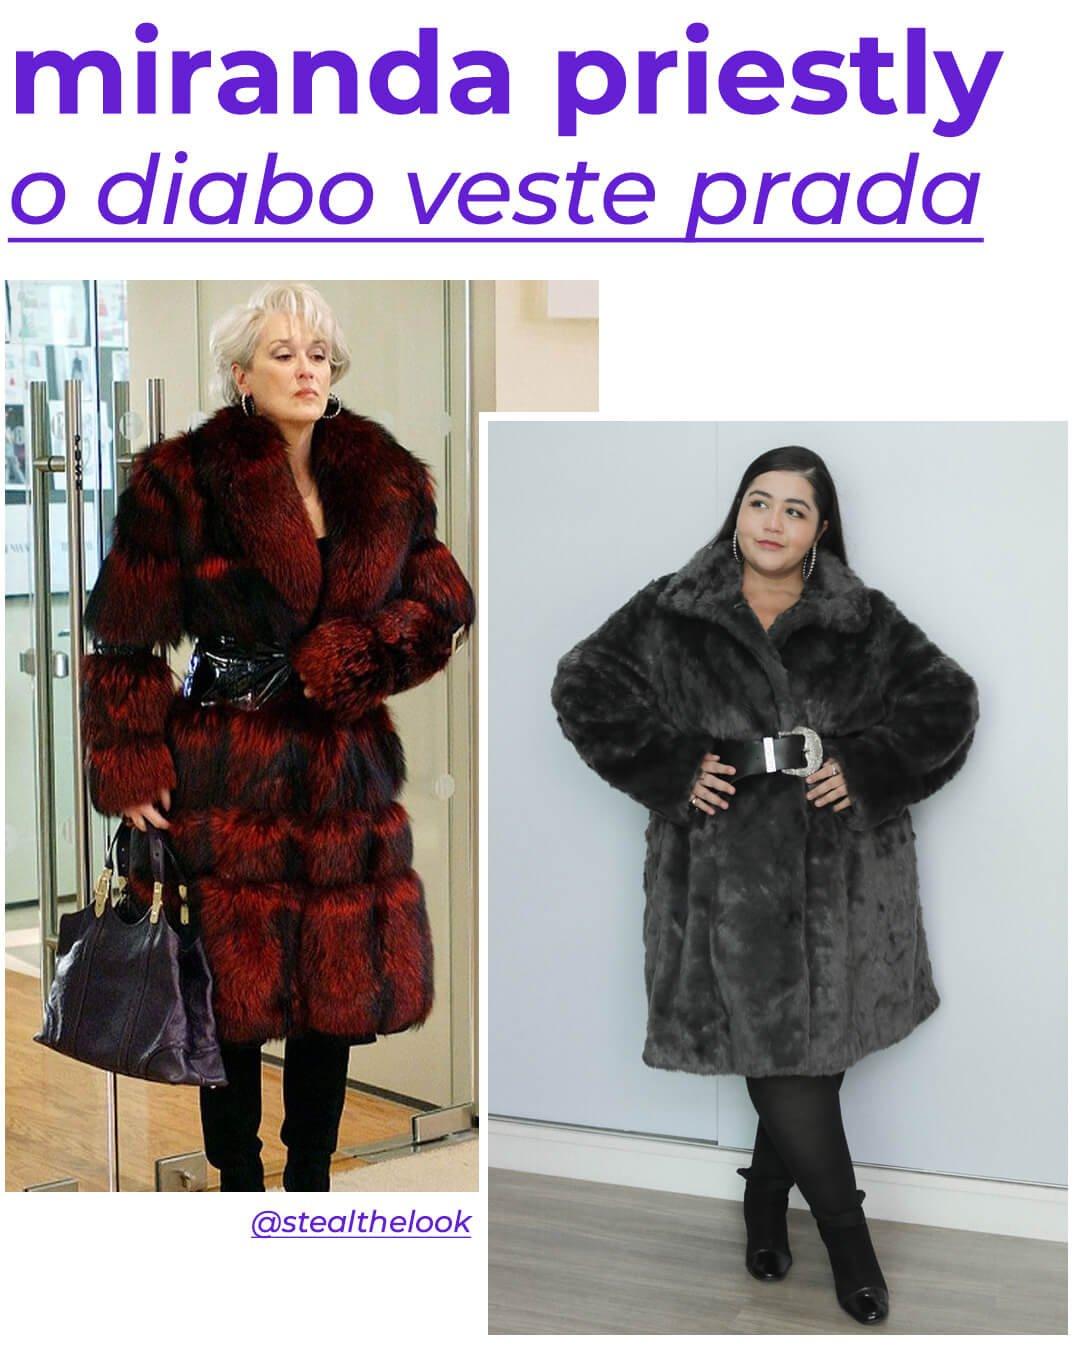 Miranda Priestly, Layla Brígido - looks de personagens - o diabo veste prada - outono - street style - https://stealthelook.com.br